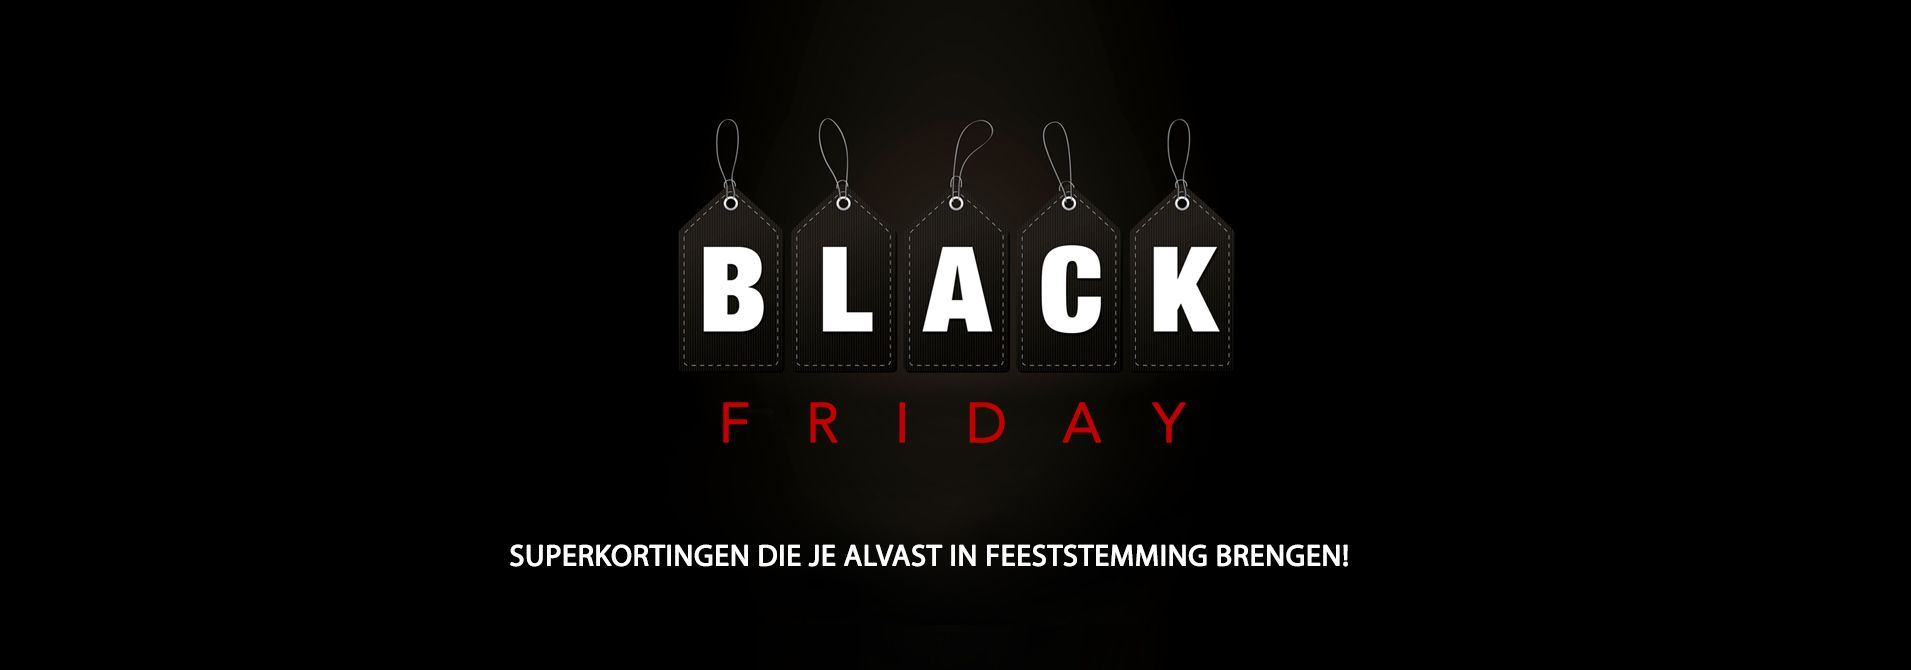 Black Friday KORTINGEN